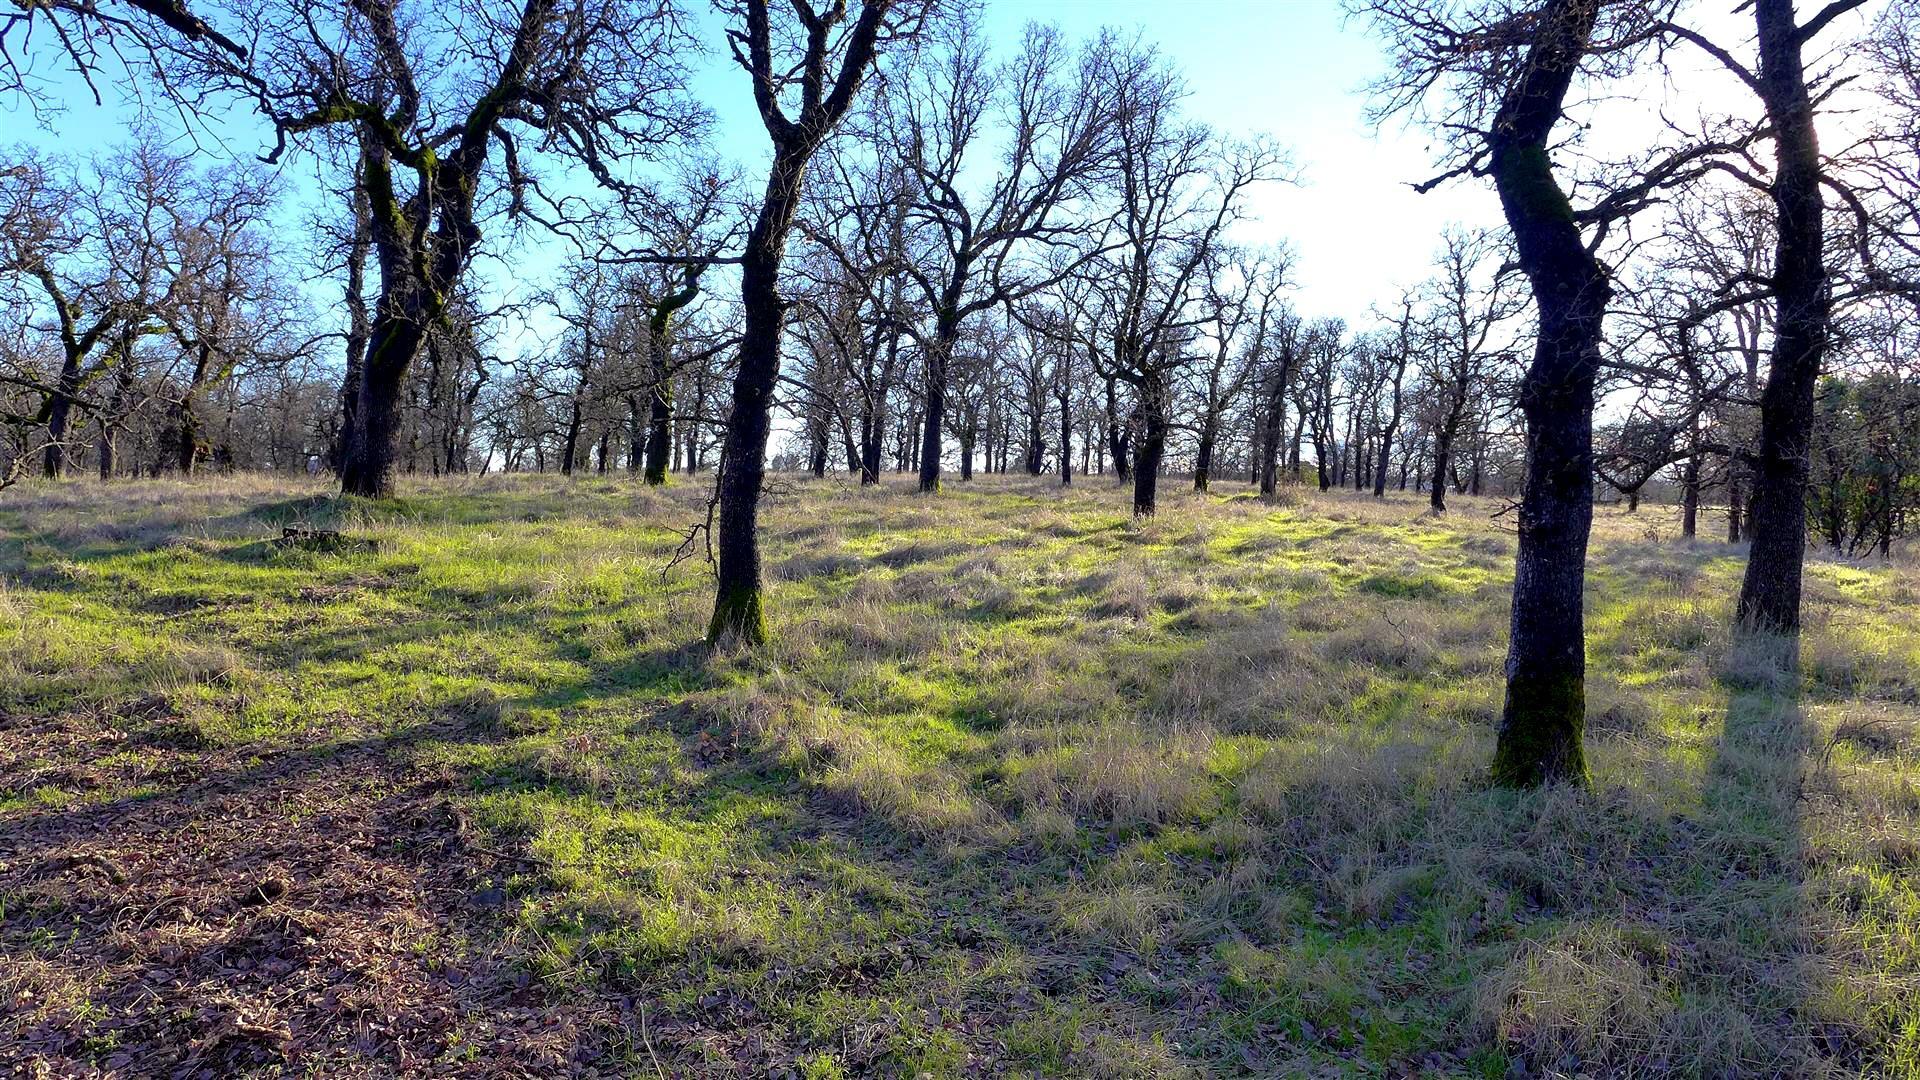 Lot 12 Woodview Dr., Palo Cedro, CA 96073